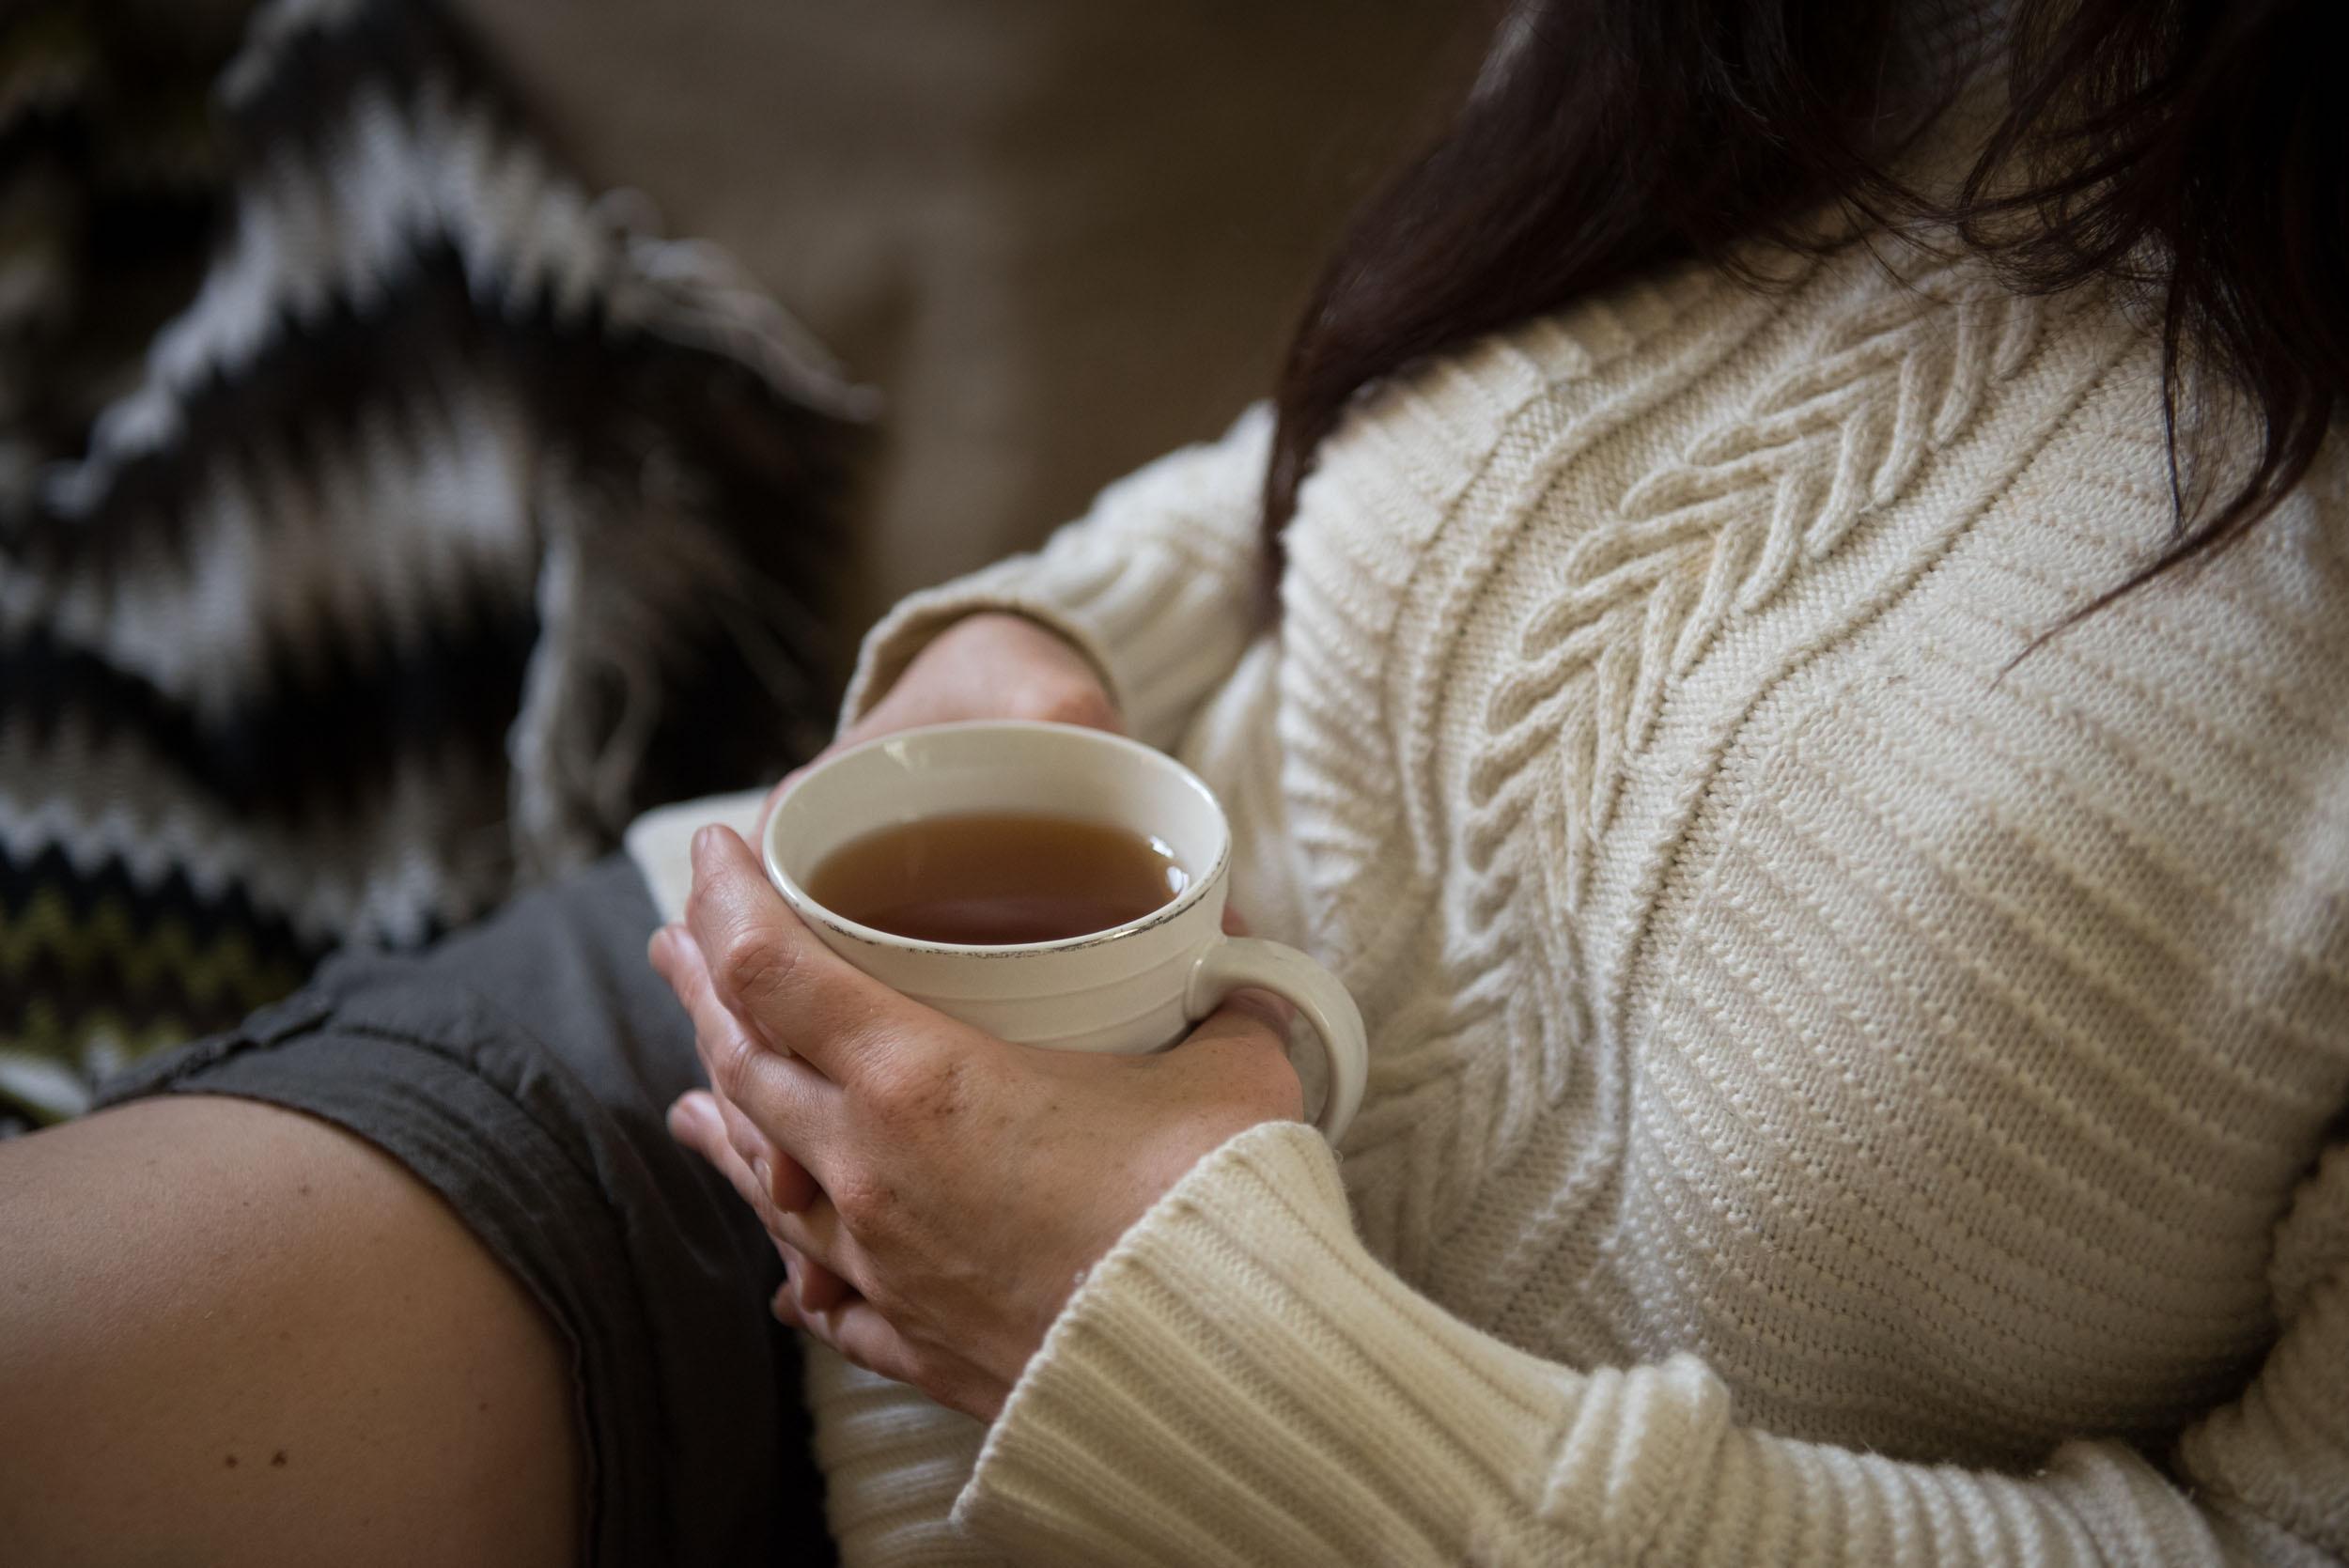 Enjoying a cup of hot tea